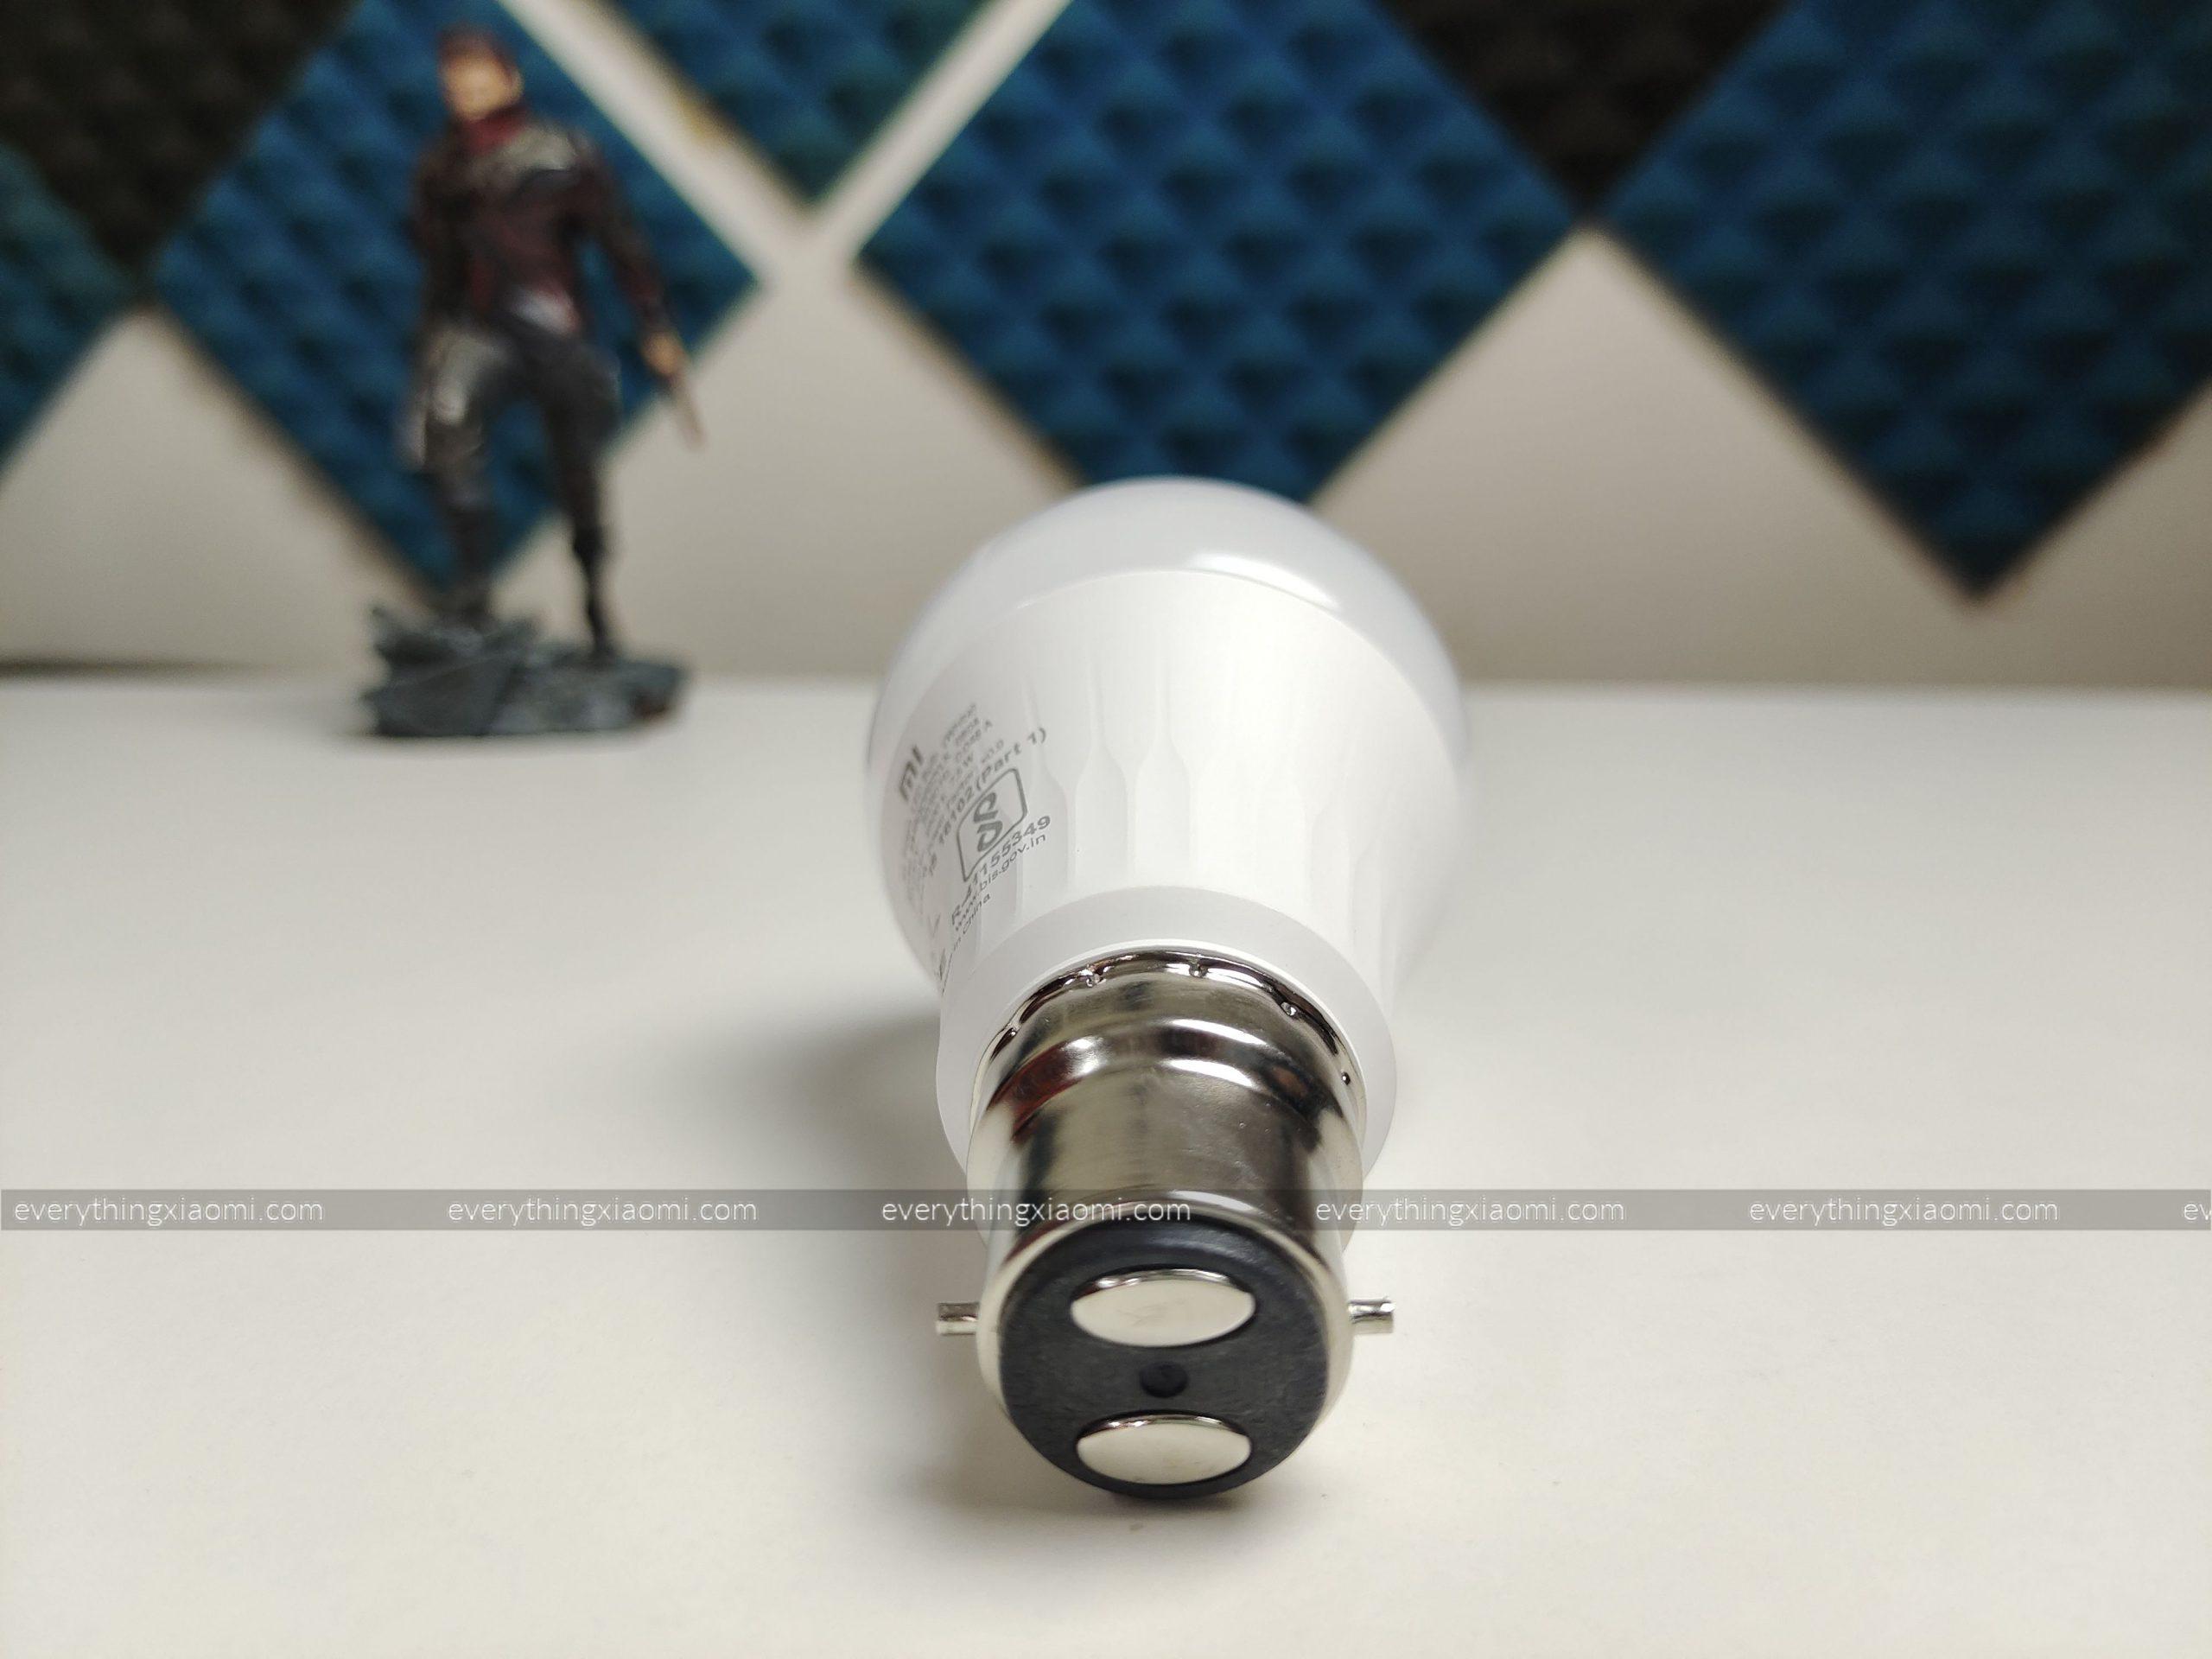 Xiaomi Mi Smart LED Bulb White 1 scaled